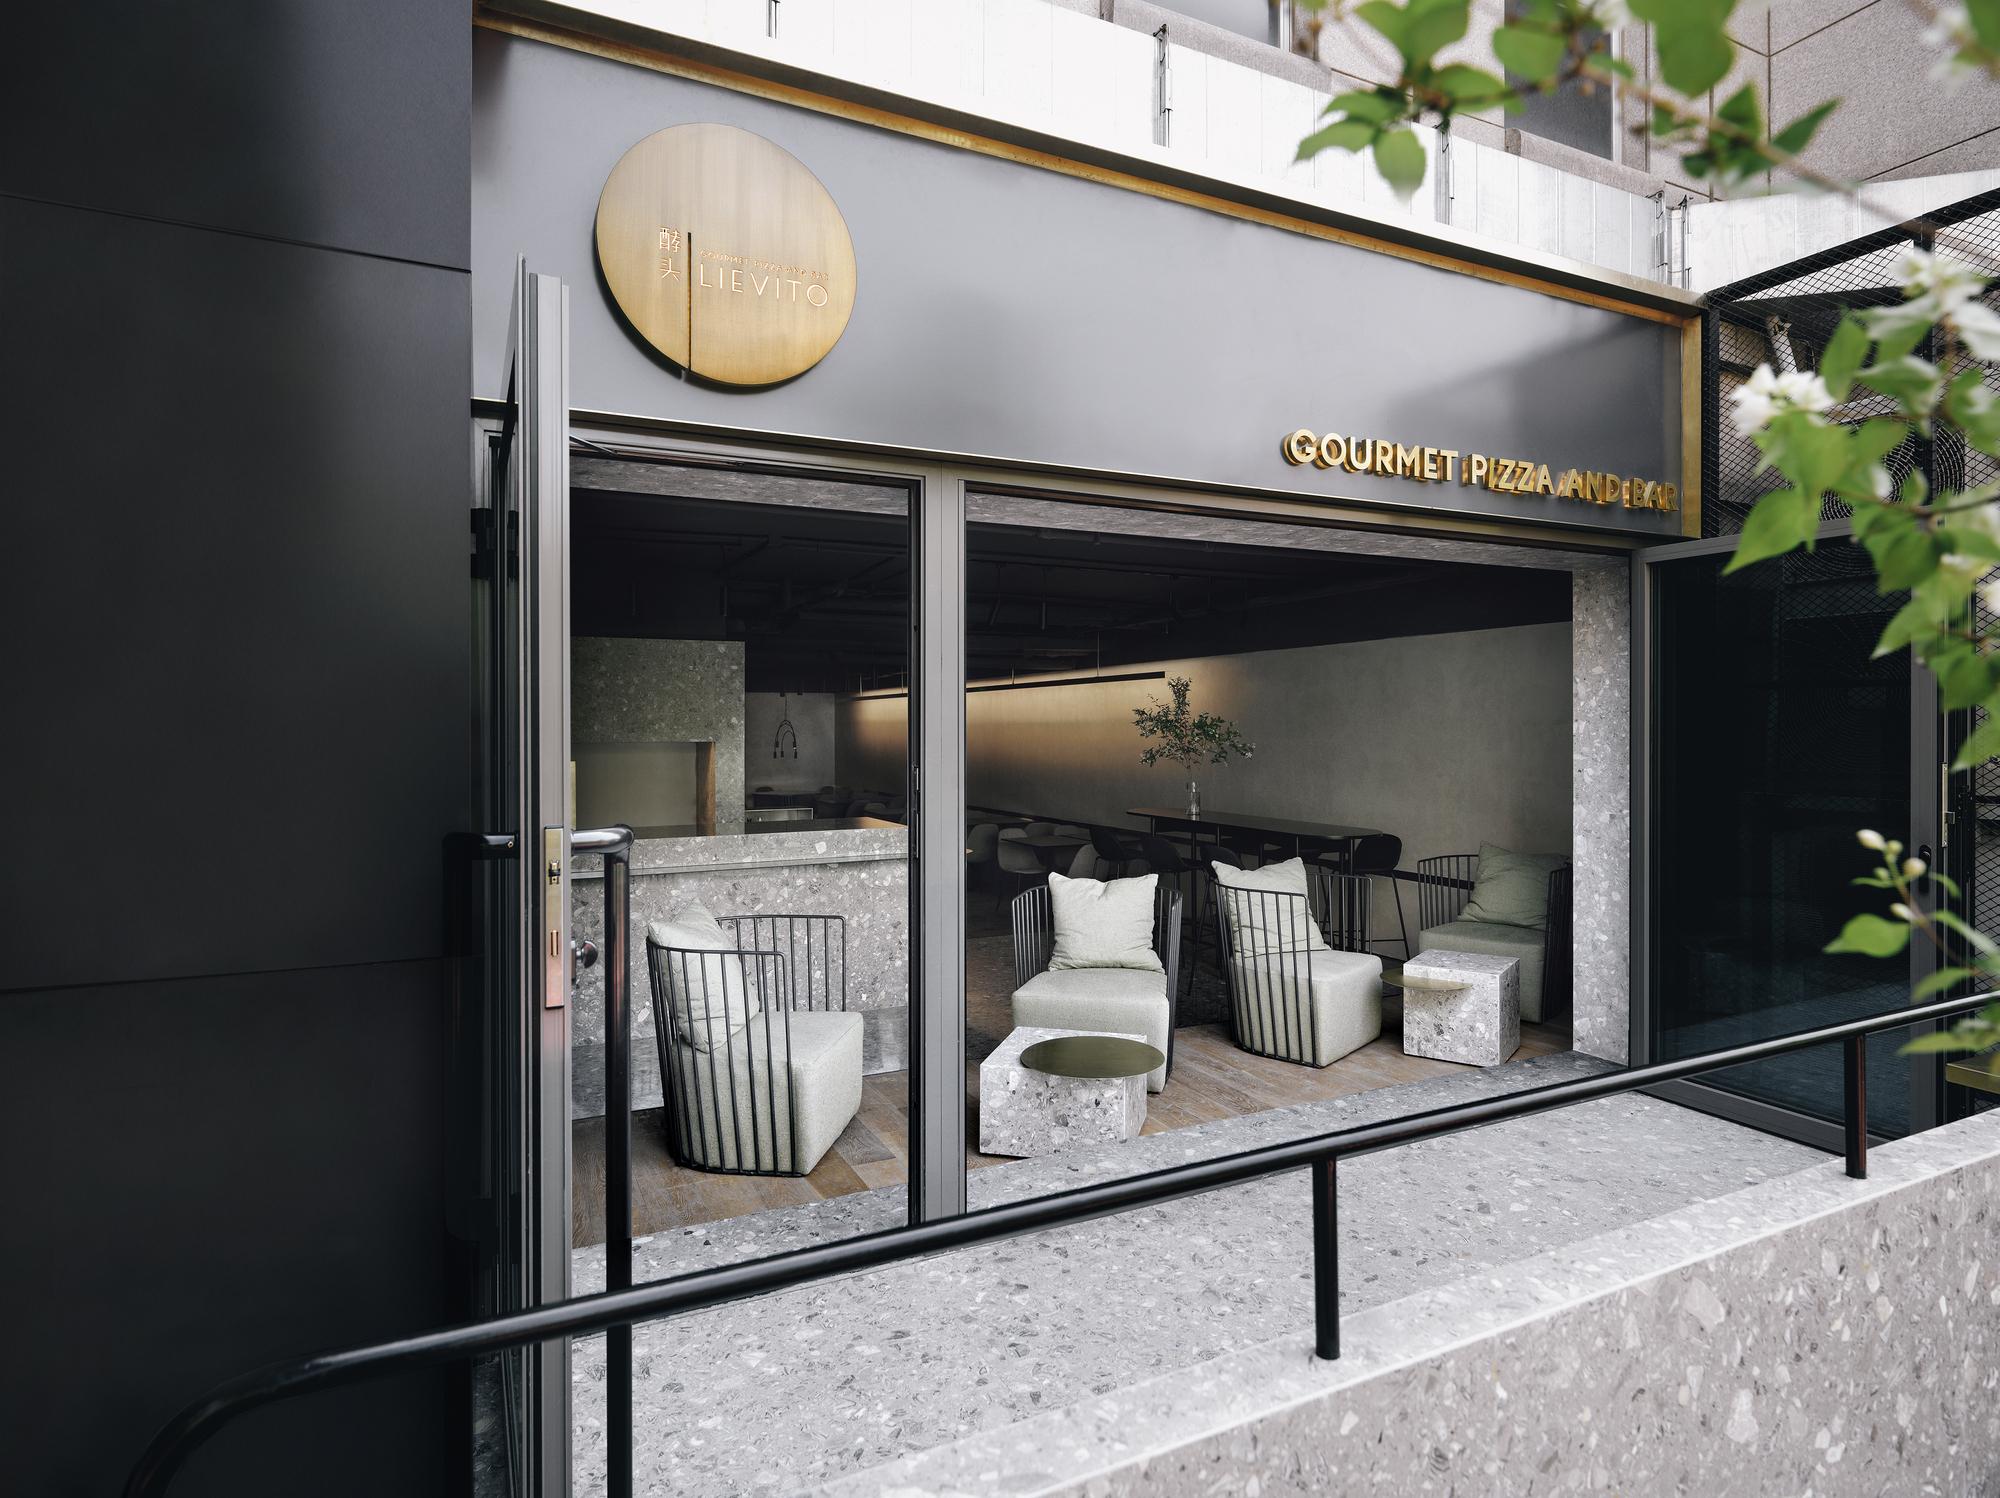 Gallery of lievito gourmet pizza and bar mddm studio 10 - Bar cuisine studio ...